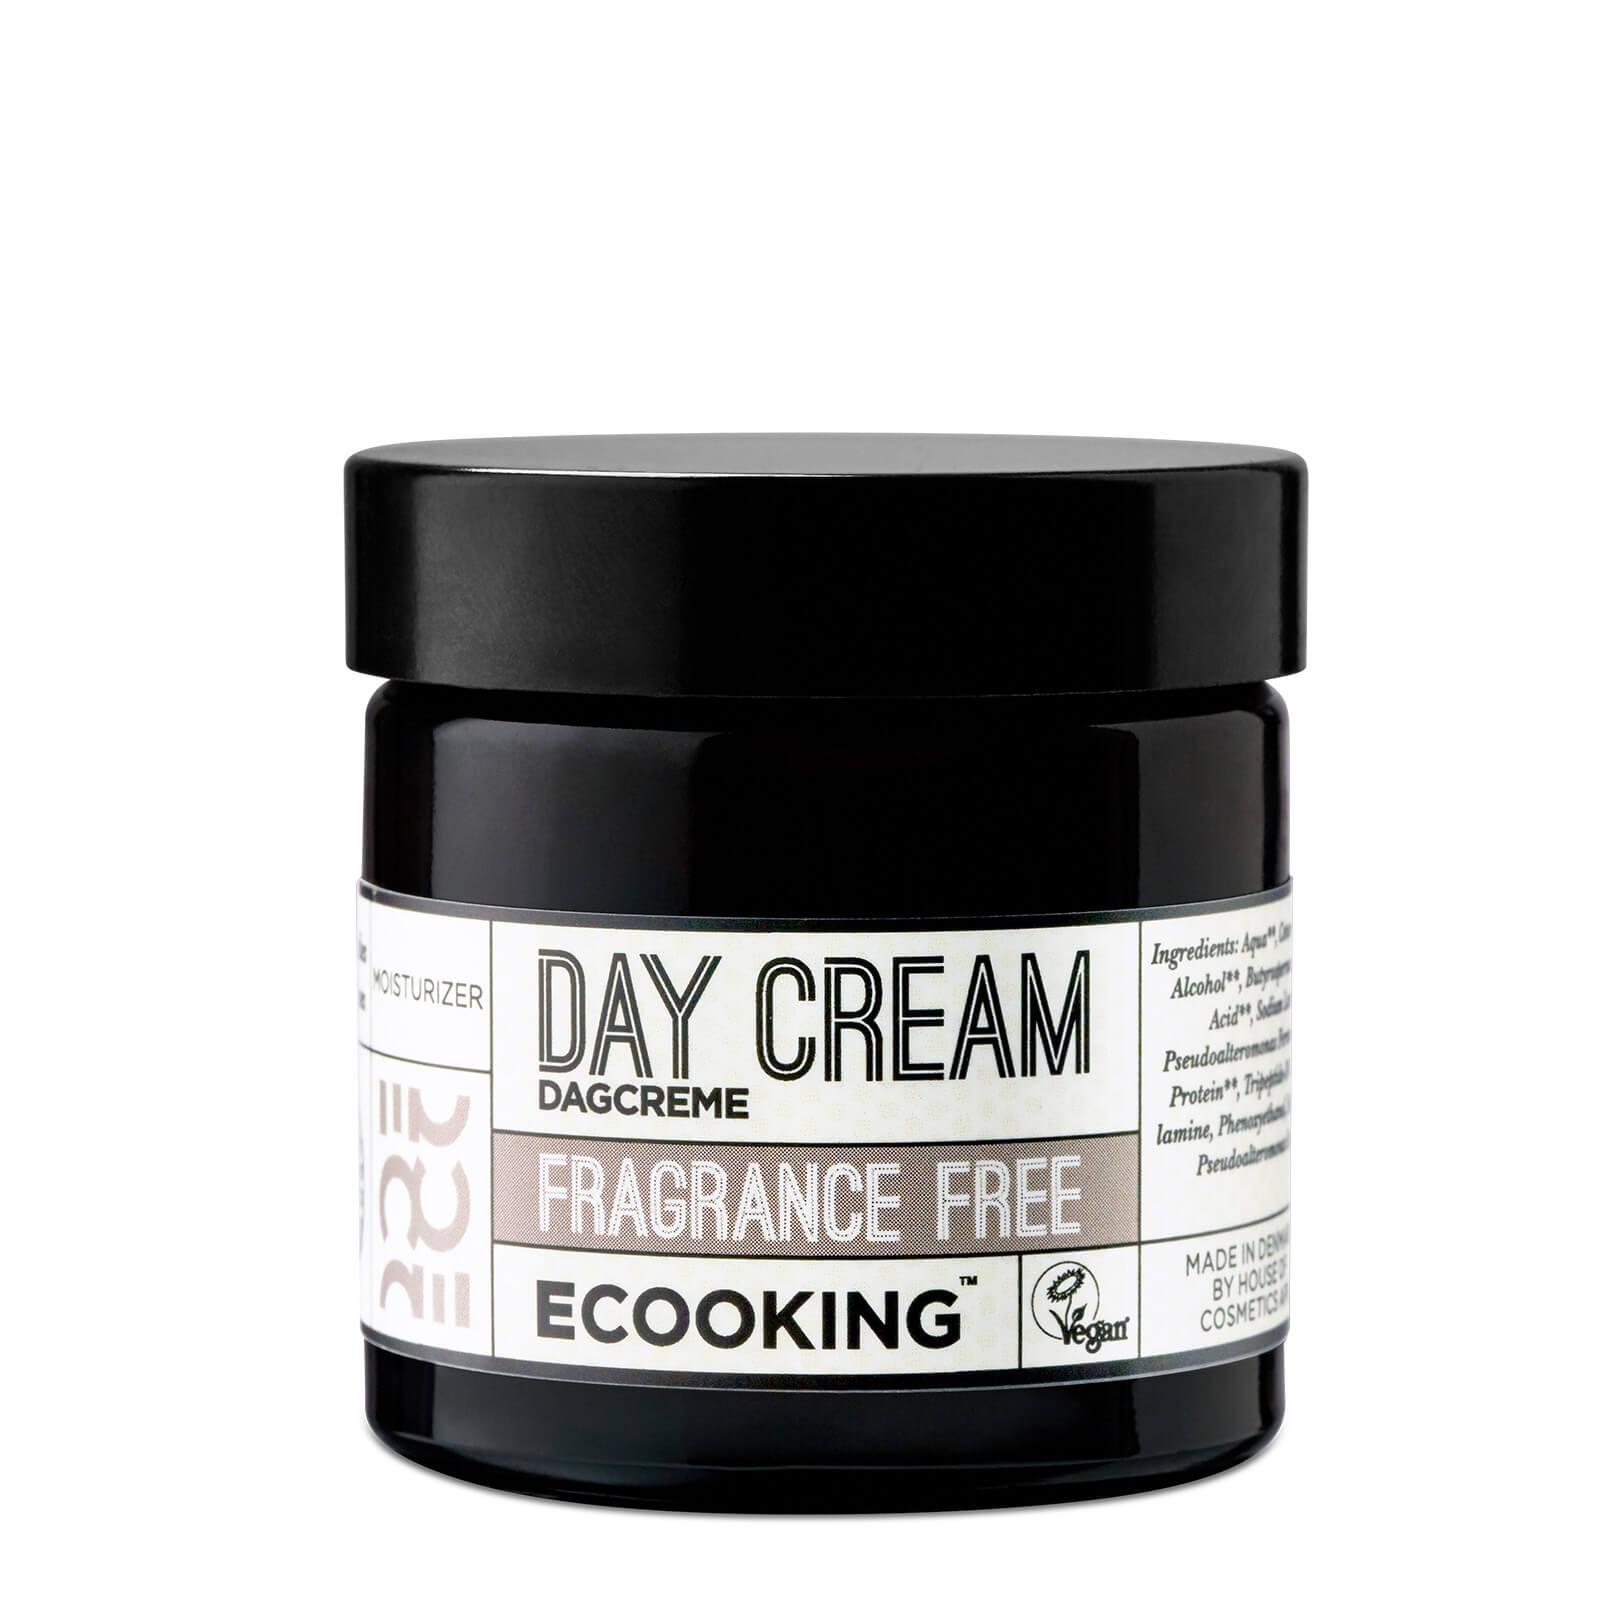 Ecooking Day Cream Fragrance Free 50ml